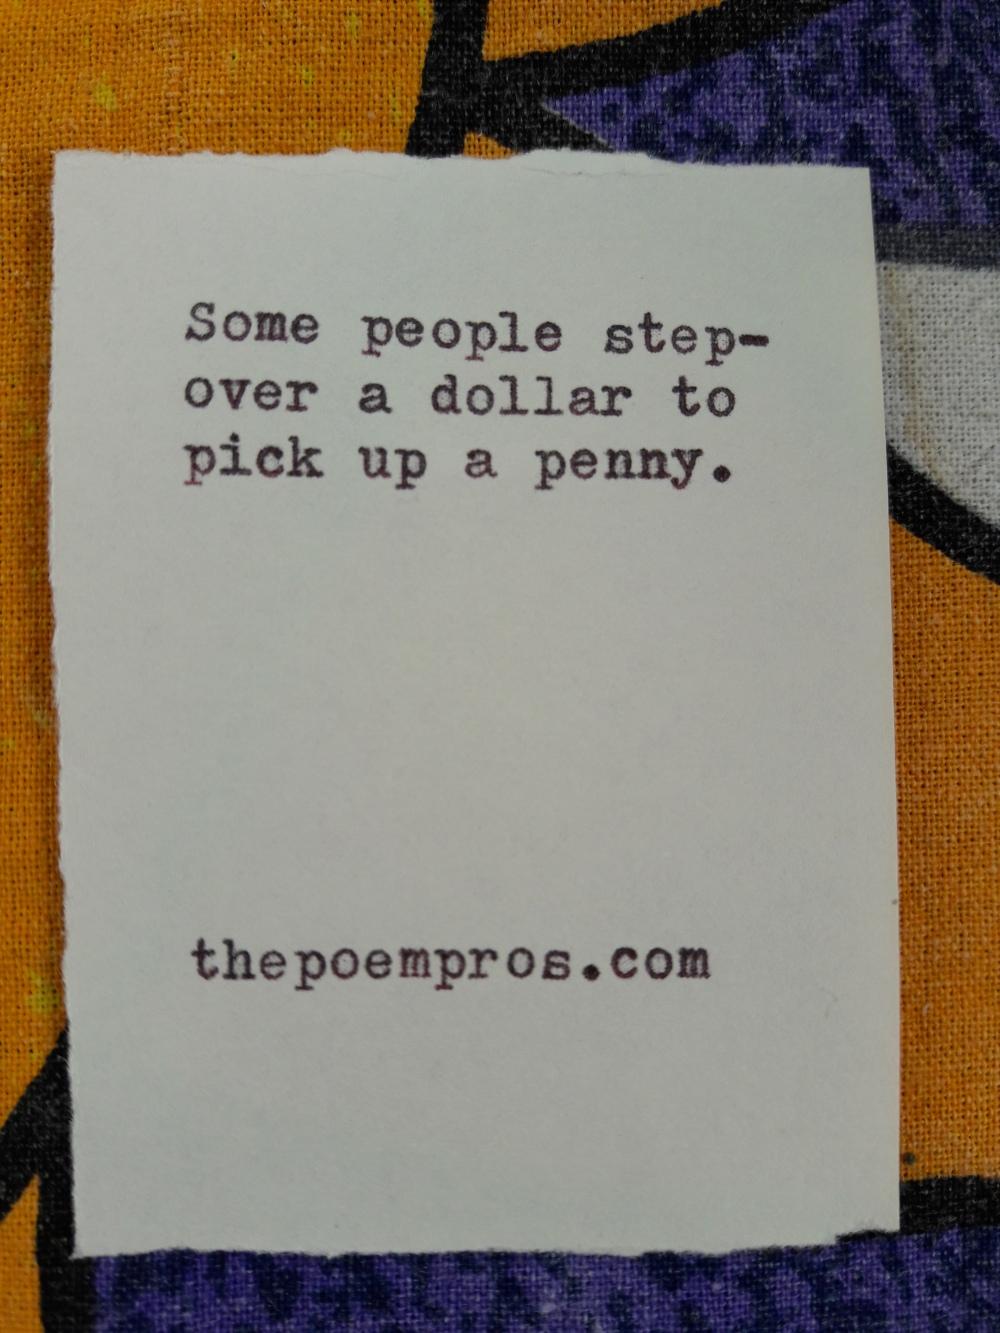 thepoempros.com